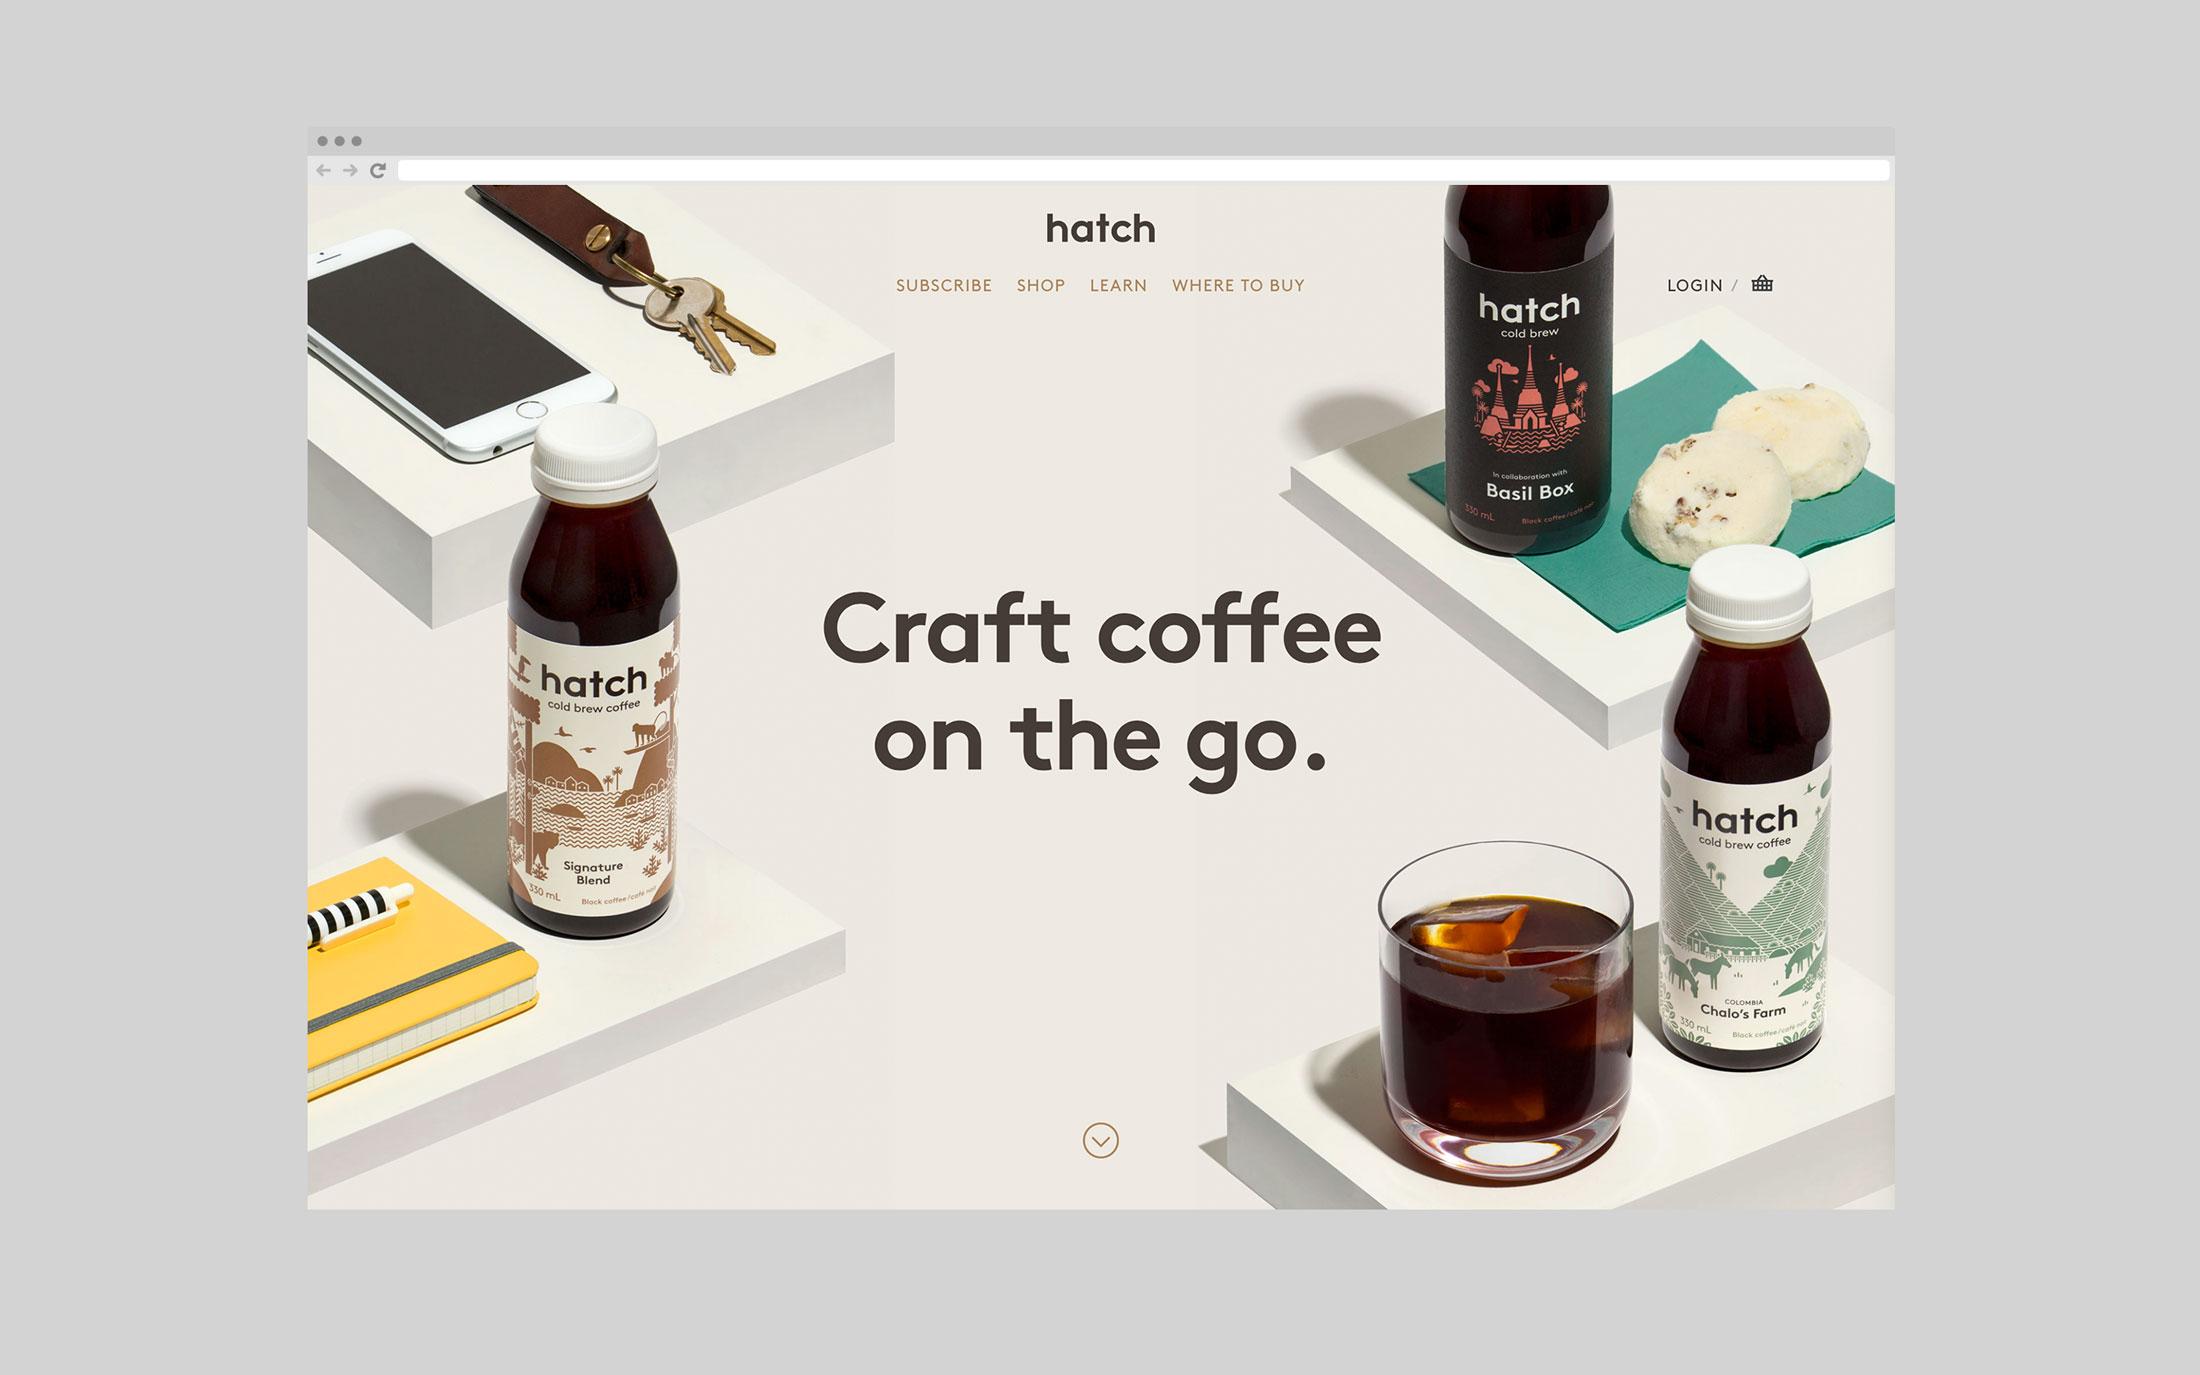 tung_hatch_website_home